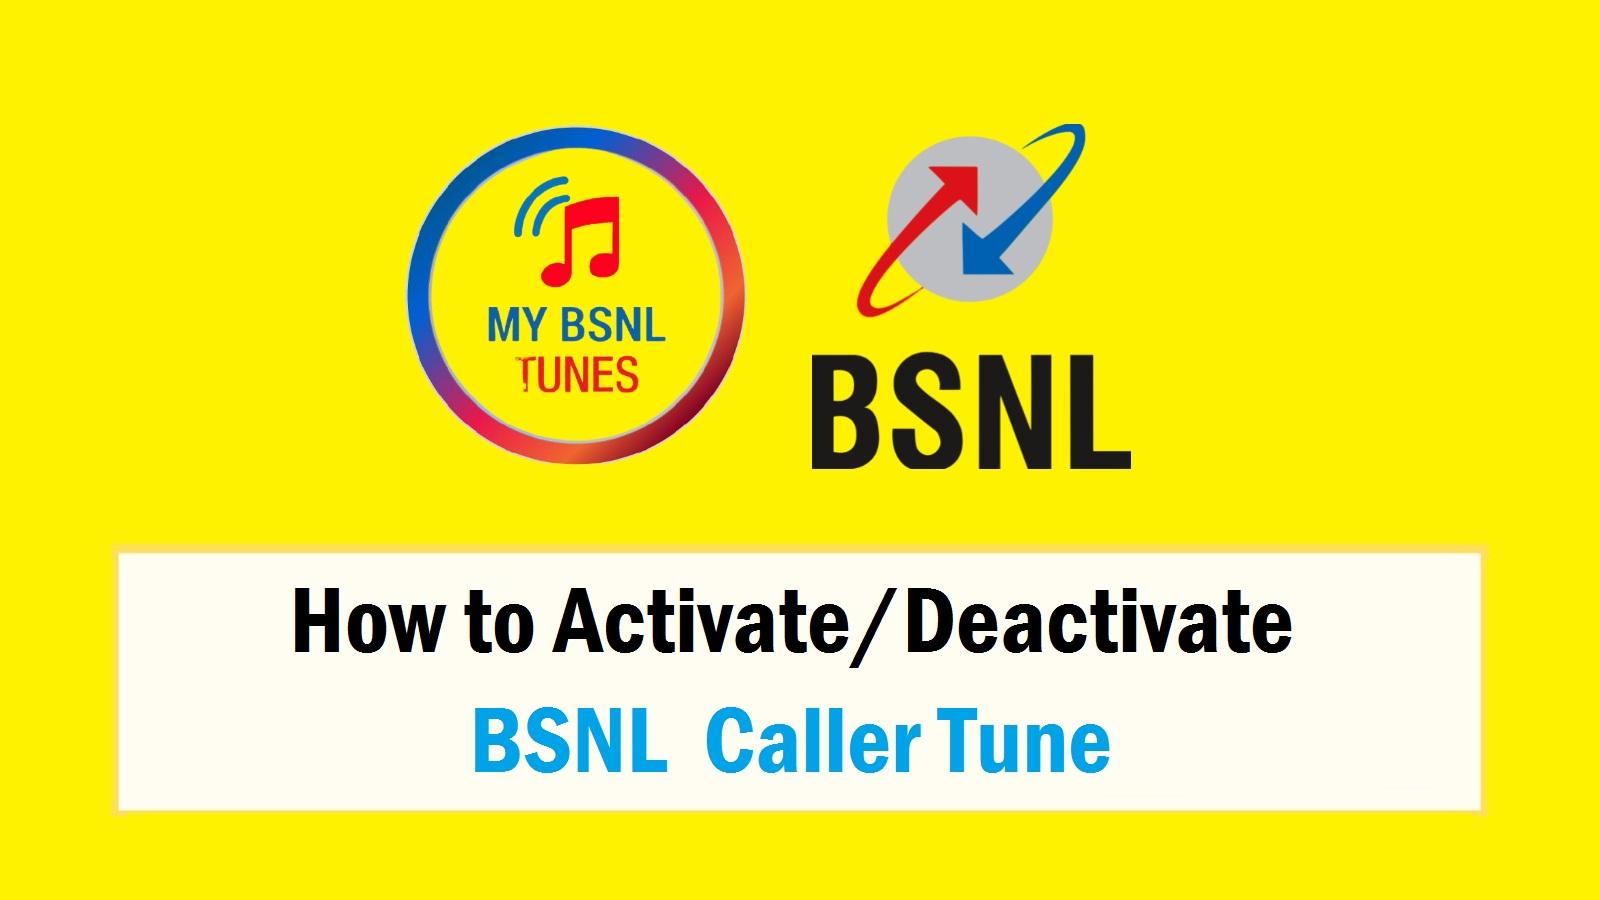 How to Activate/Deactivate BSNL Caller Tune